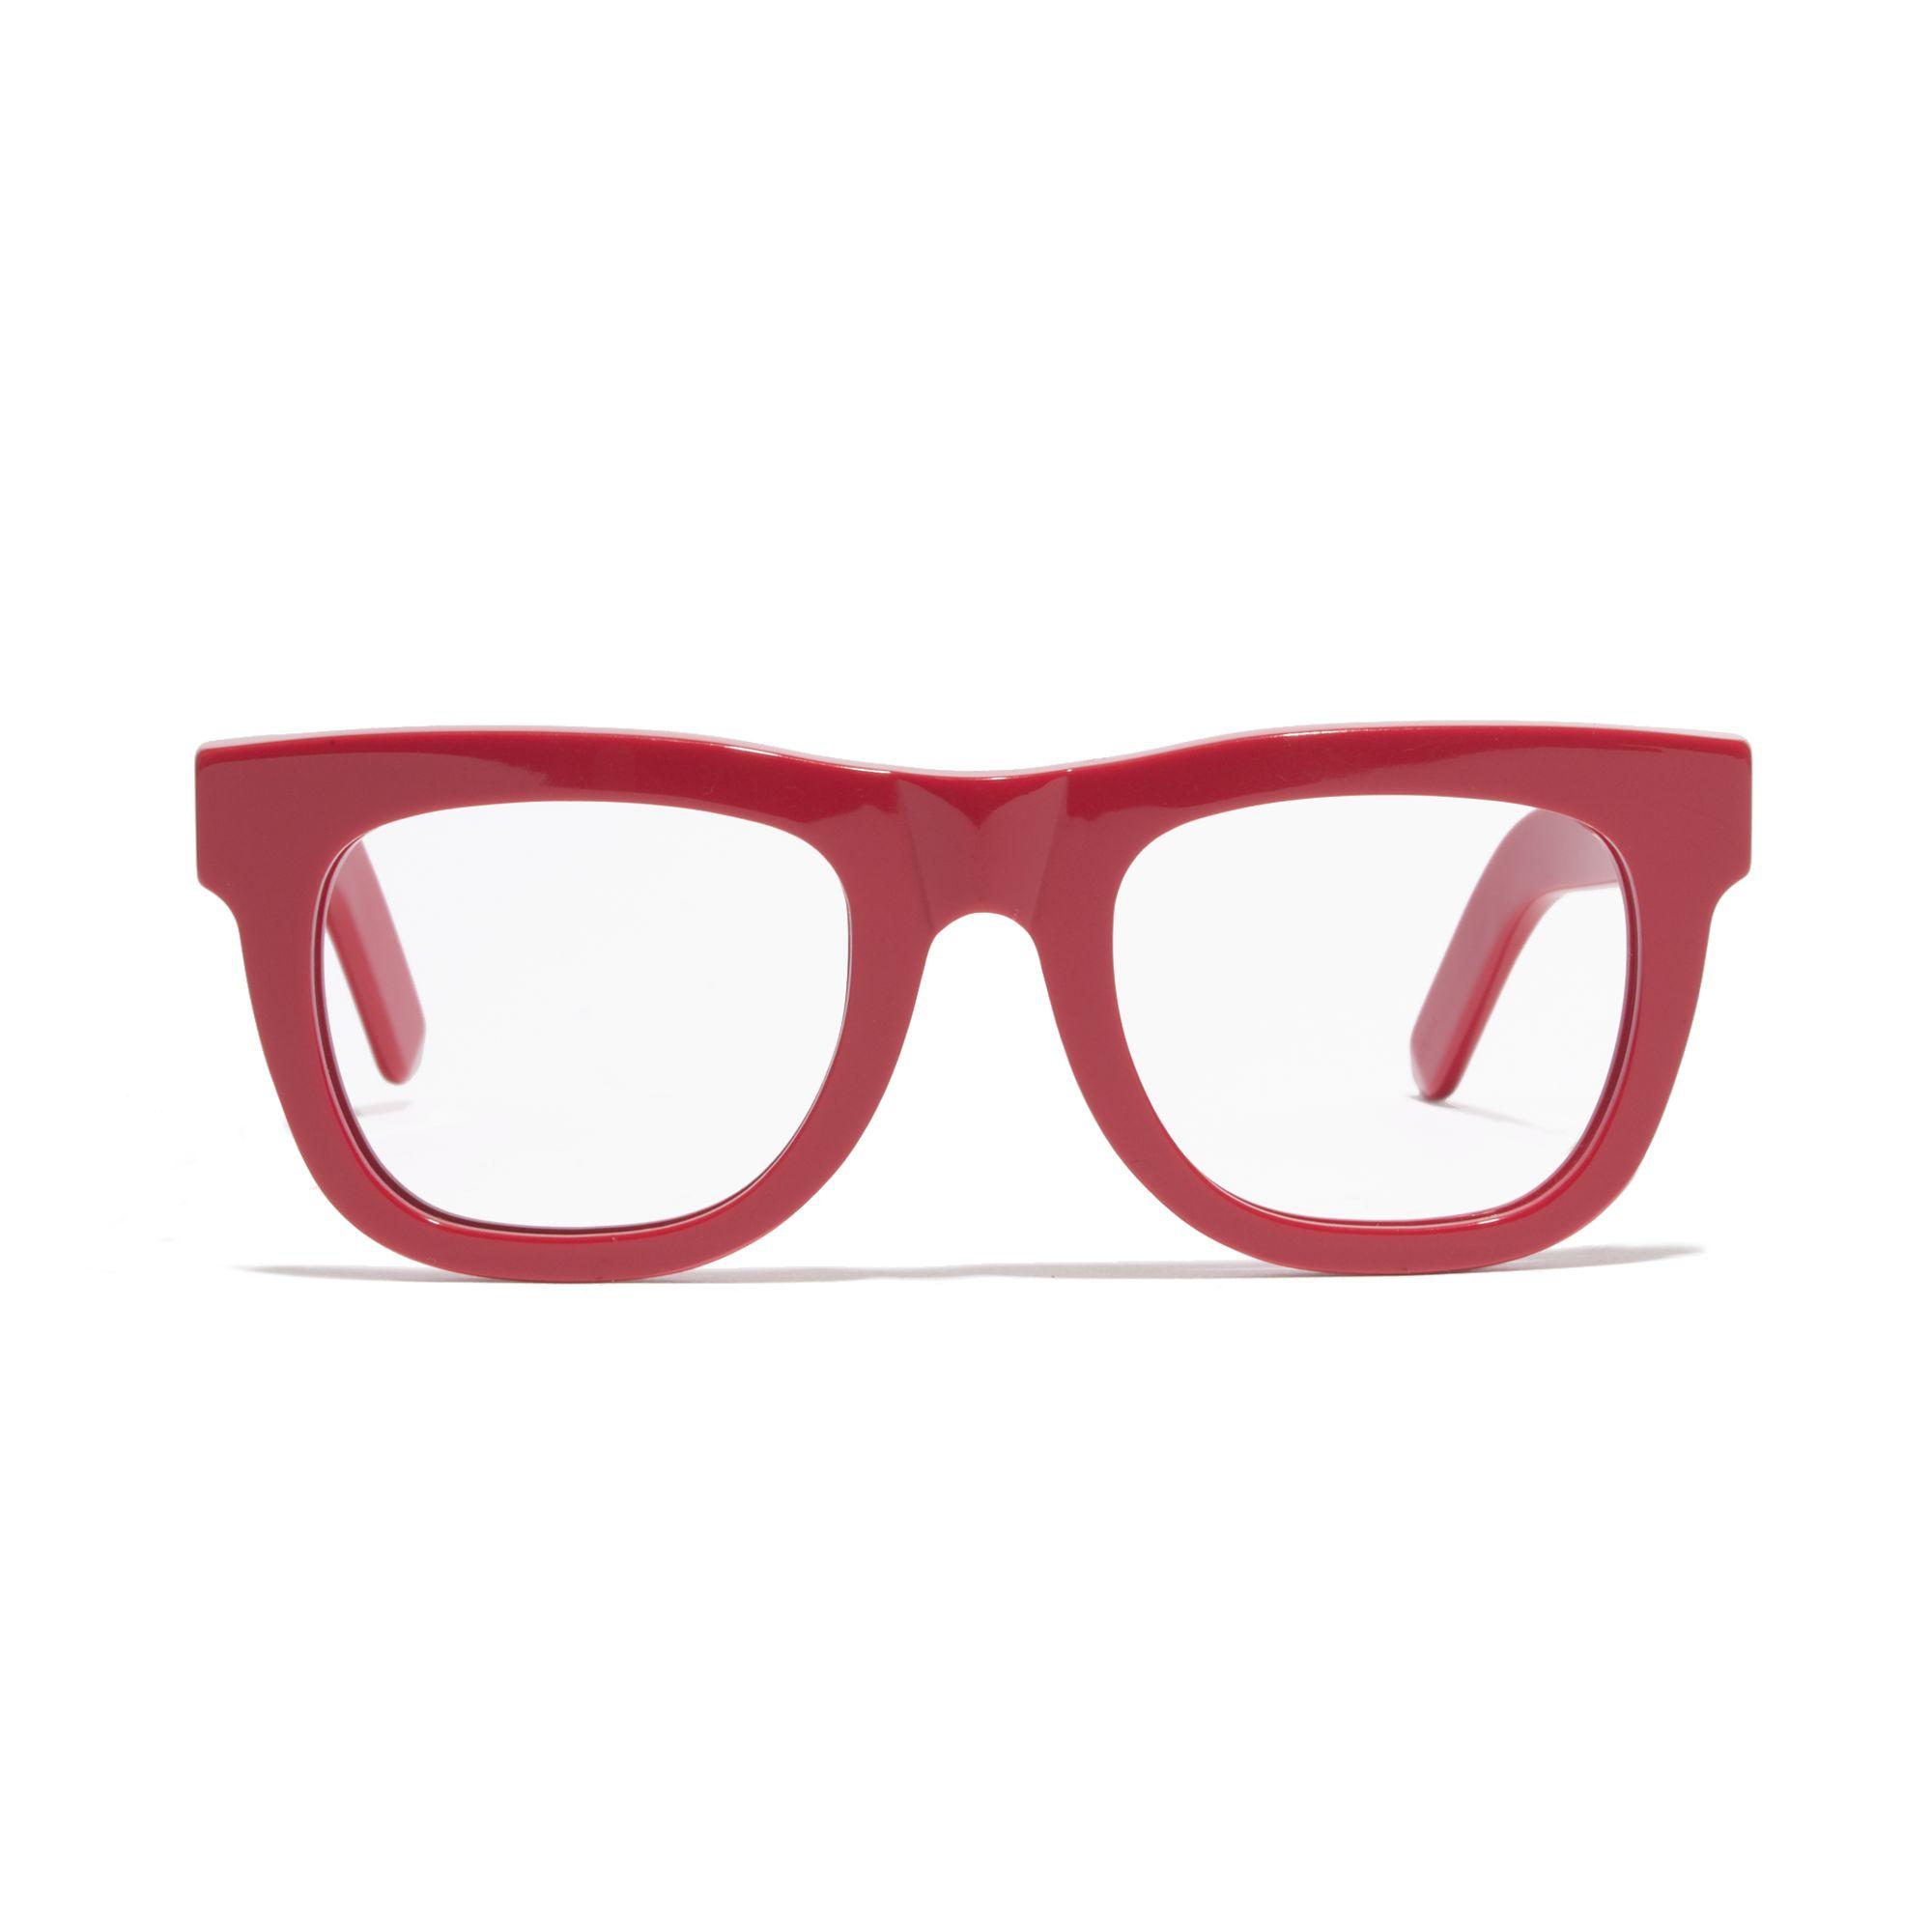 madewell ciccio eyeglasses in lyst